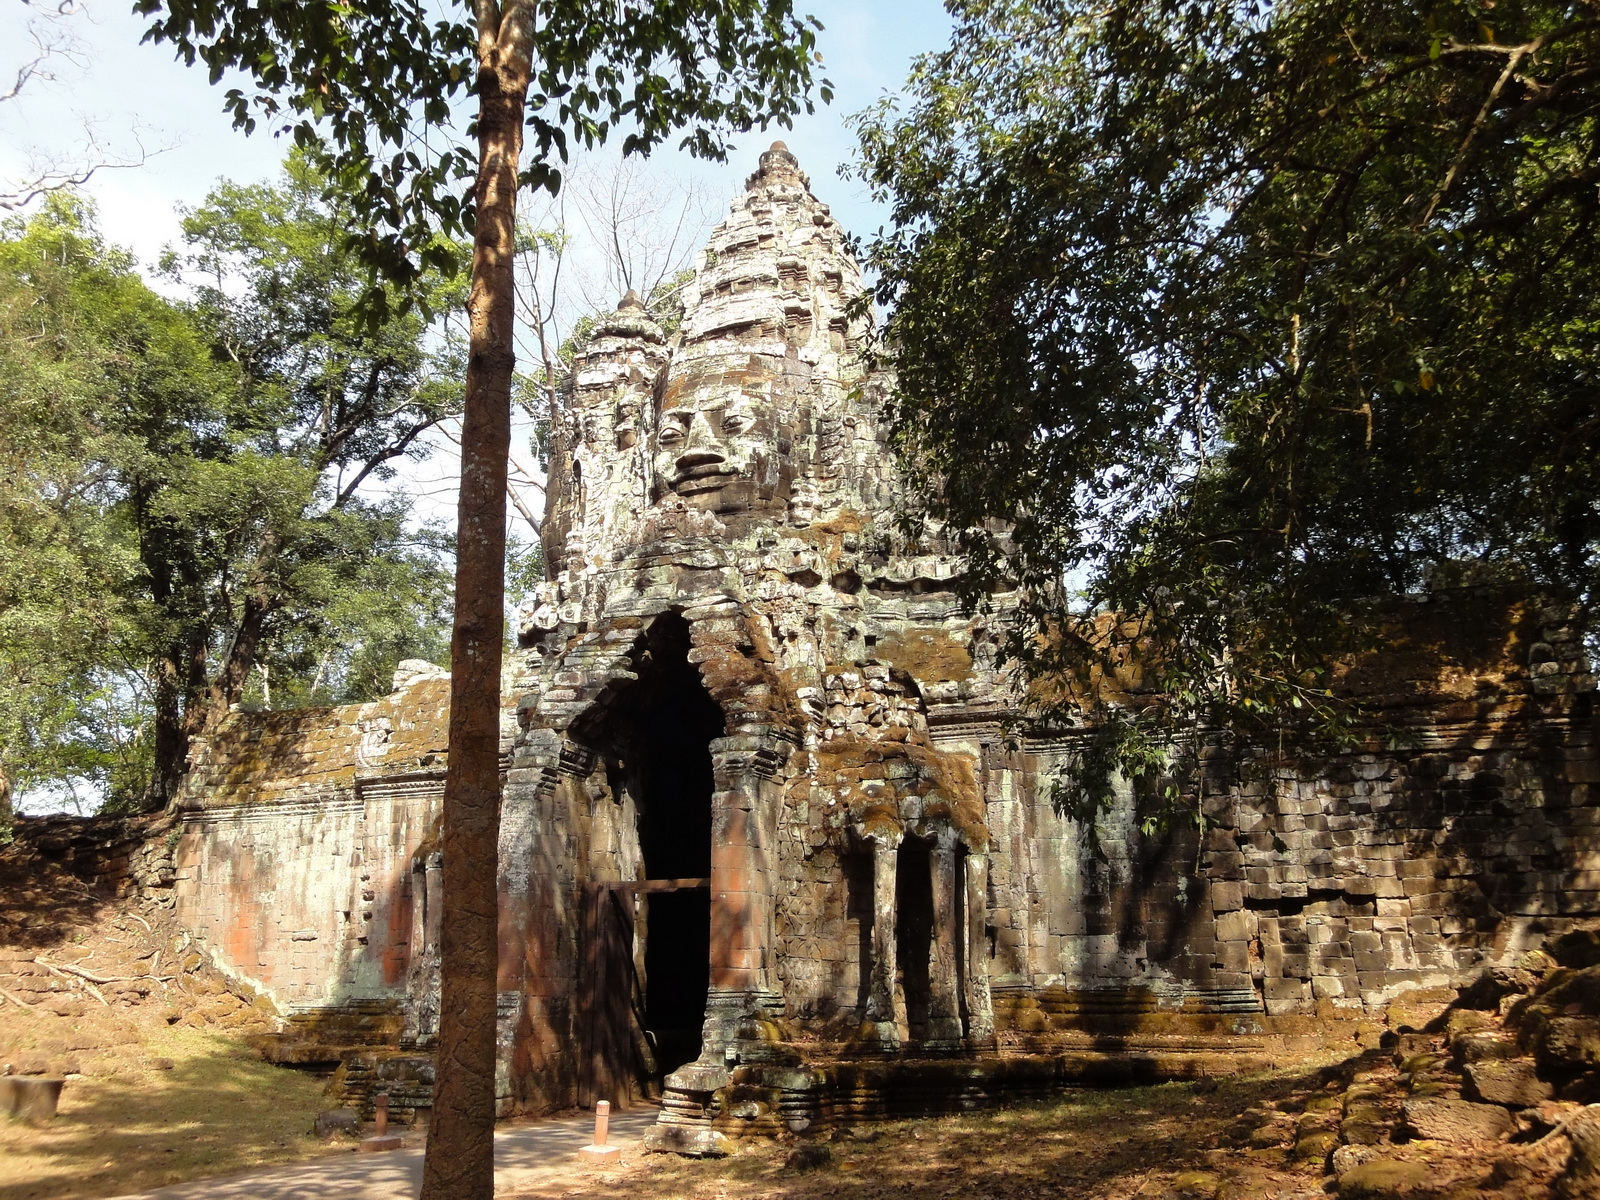 Angkor Wat style architecture North Gate Jan 2010 05